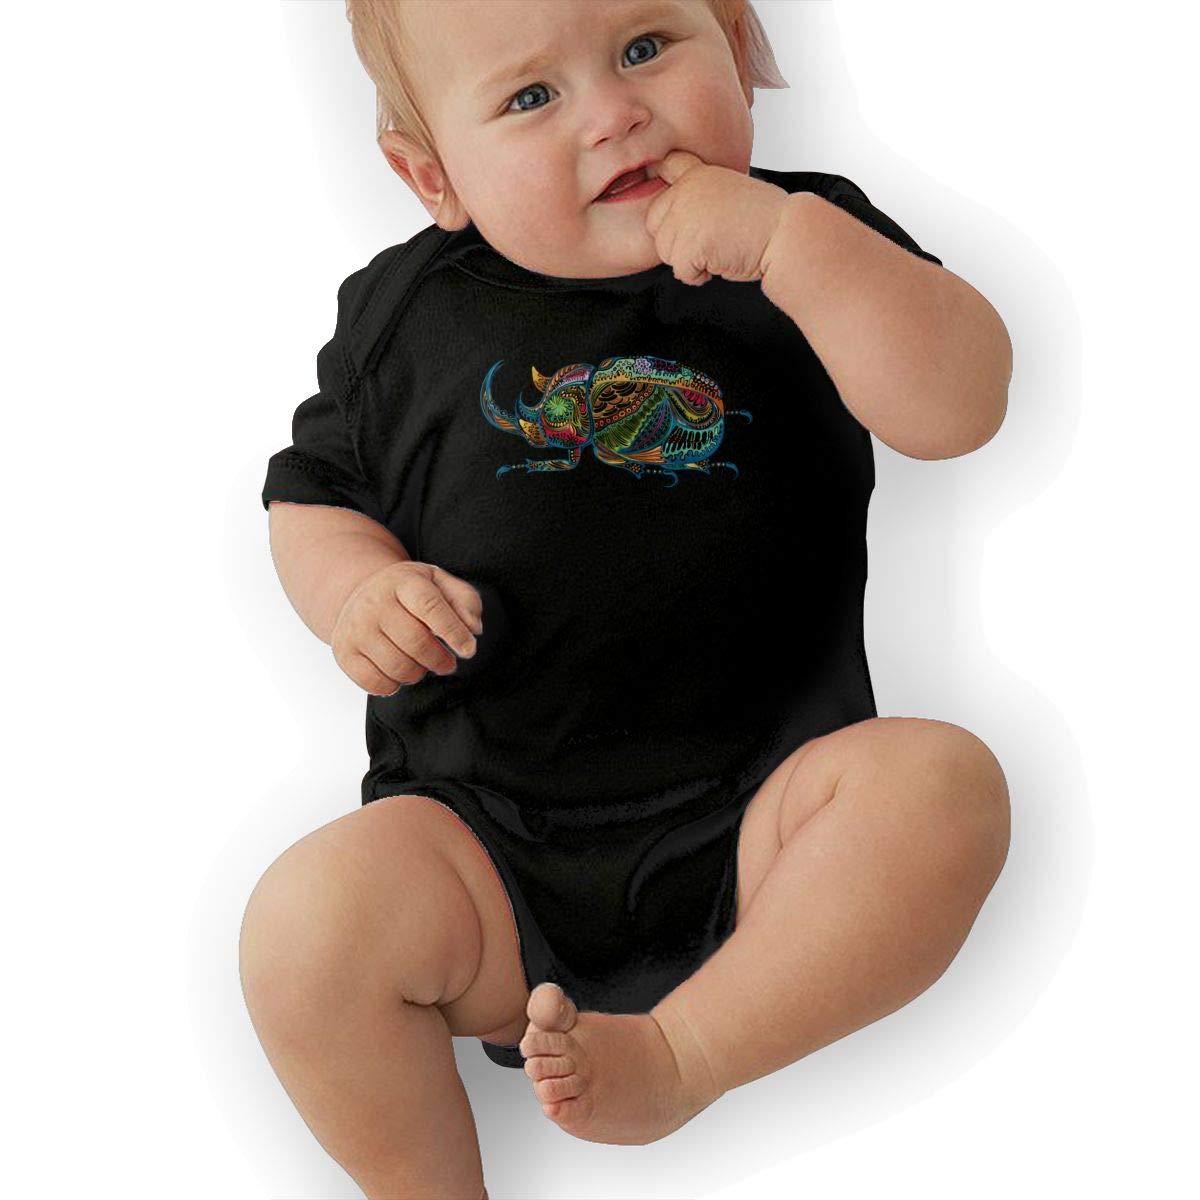 Creative Artistic Colorful The Beetle Newborn Infant Toddler Baby Girls Boys Bodysuit Short Sleeve 0-24 MonthsBlack